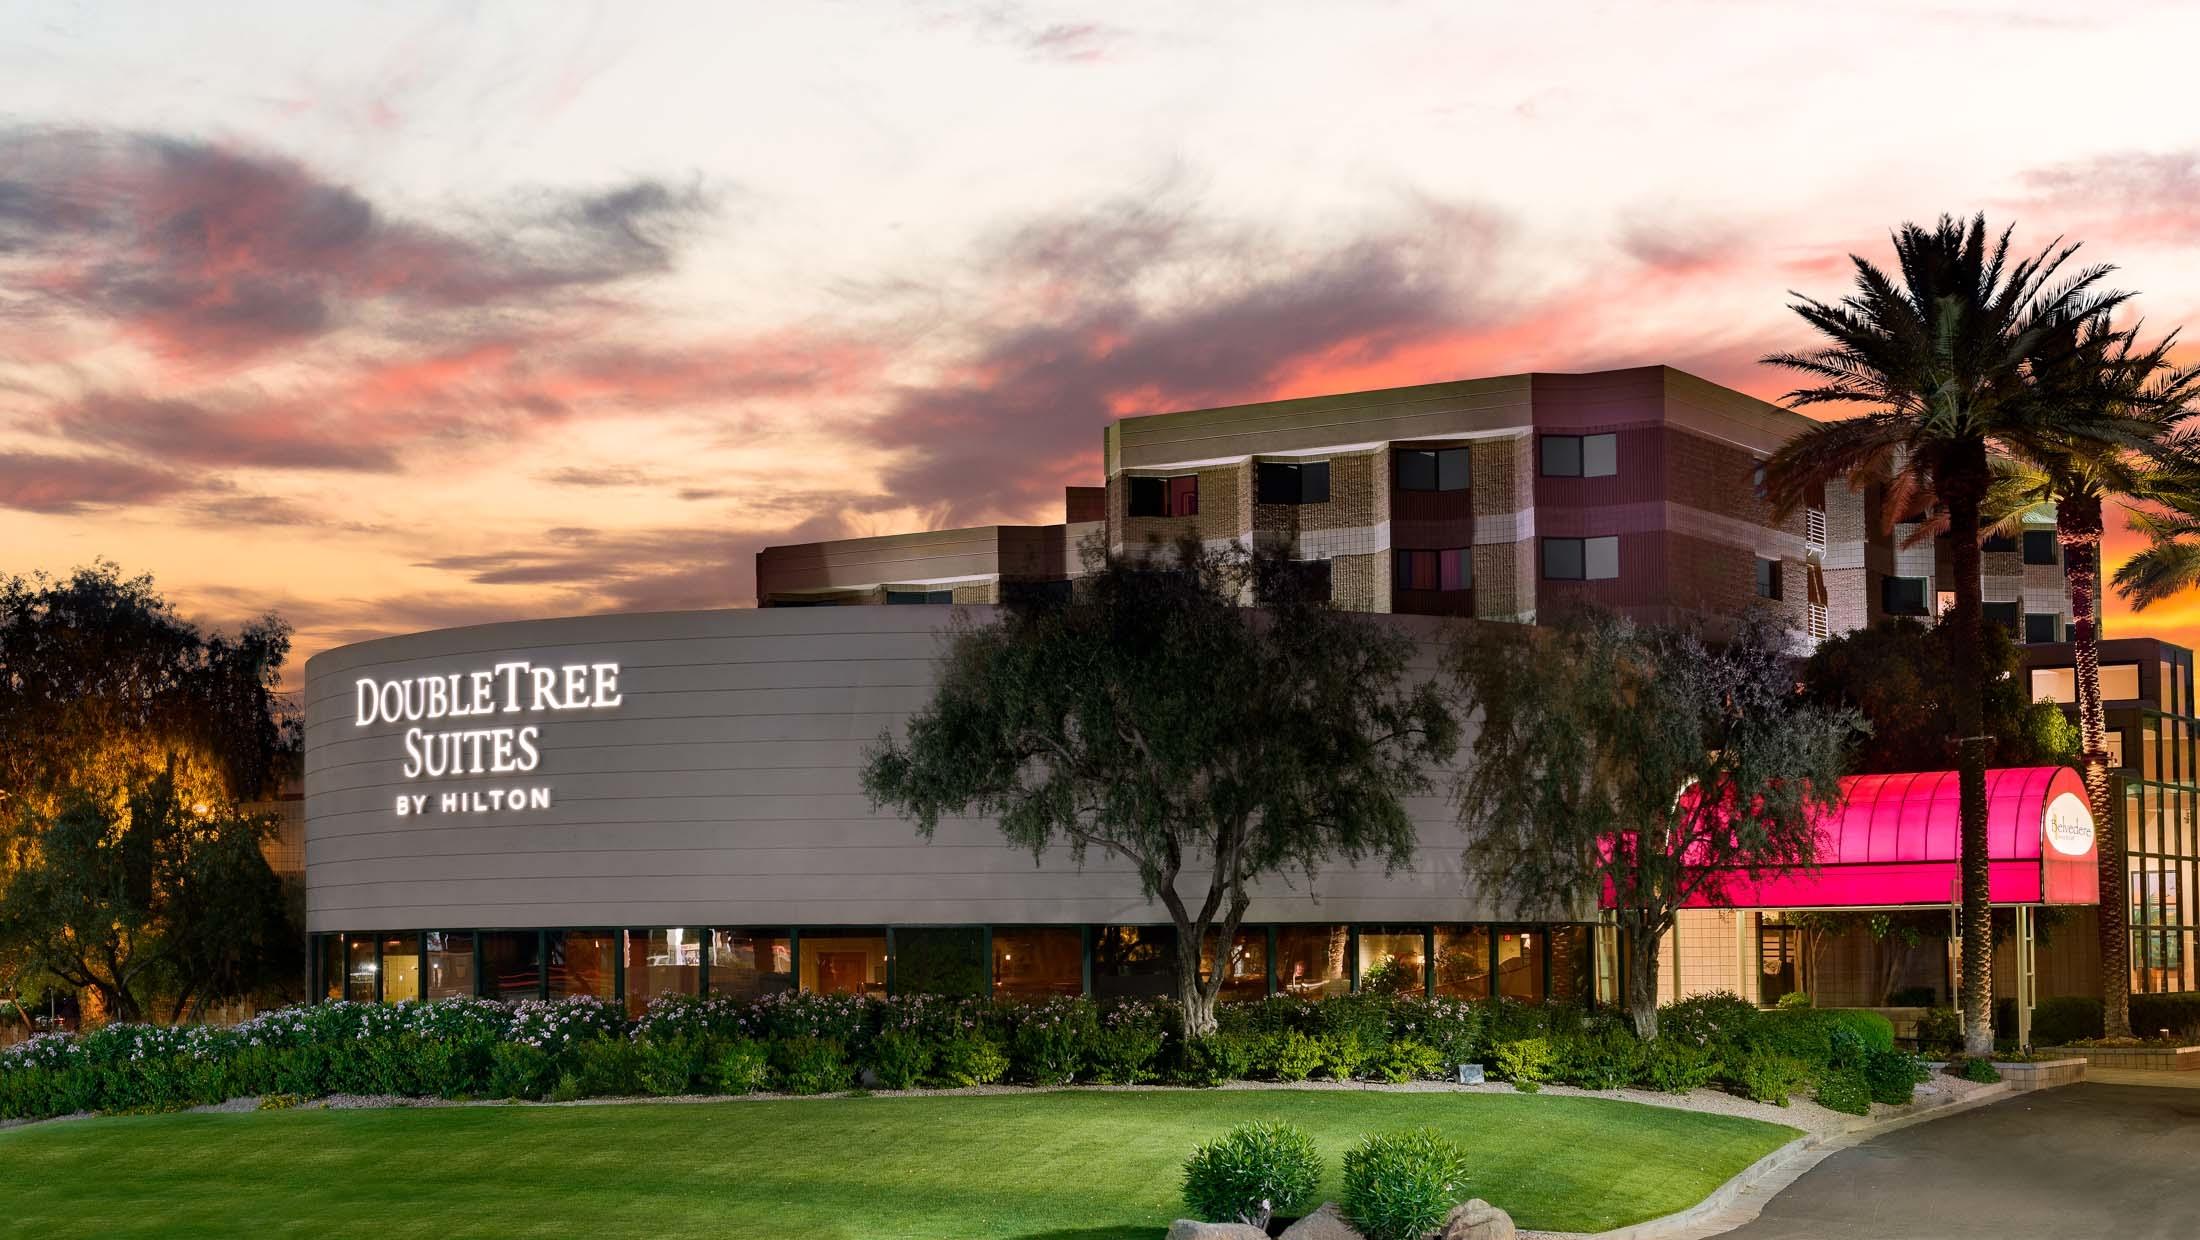 DoubleTree Suites by Hilton Hotel Phoenix image 1